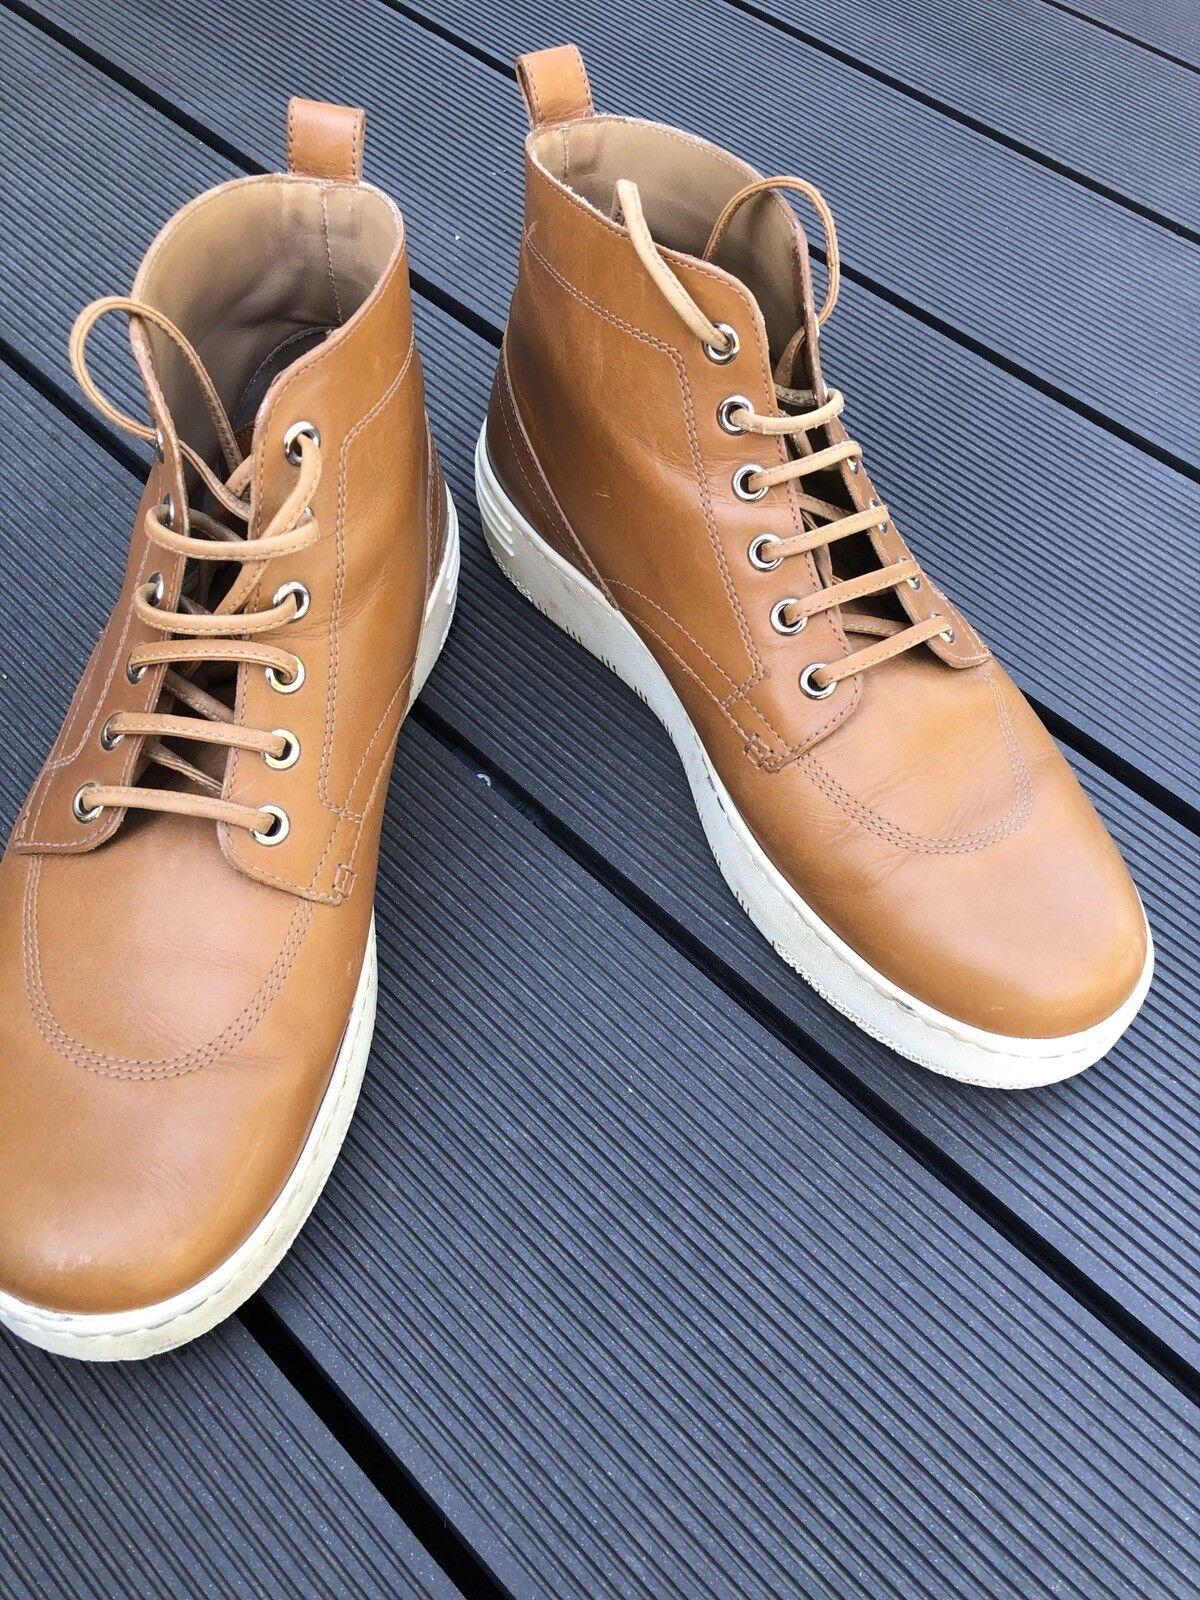 Schuhe Bally Bally Schuhe grösse 42 1/2 (8,5) 36ccb1